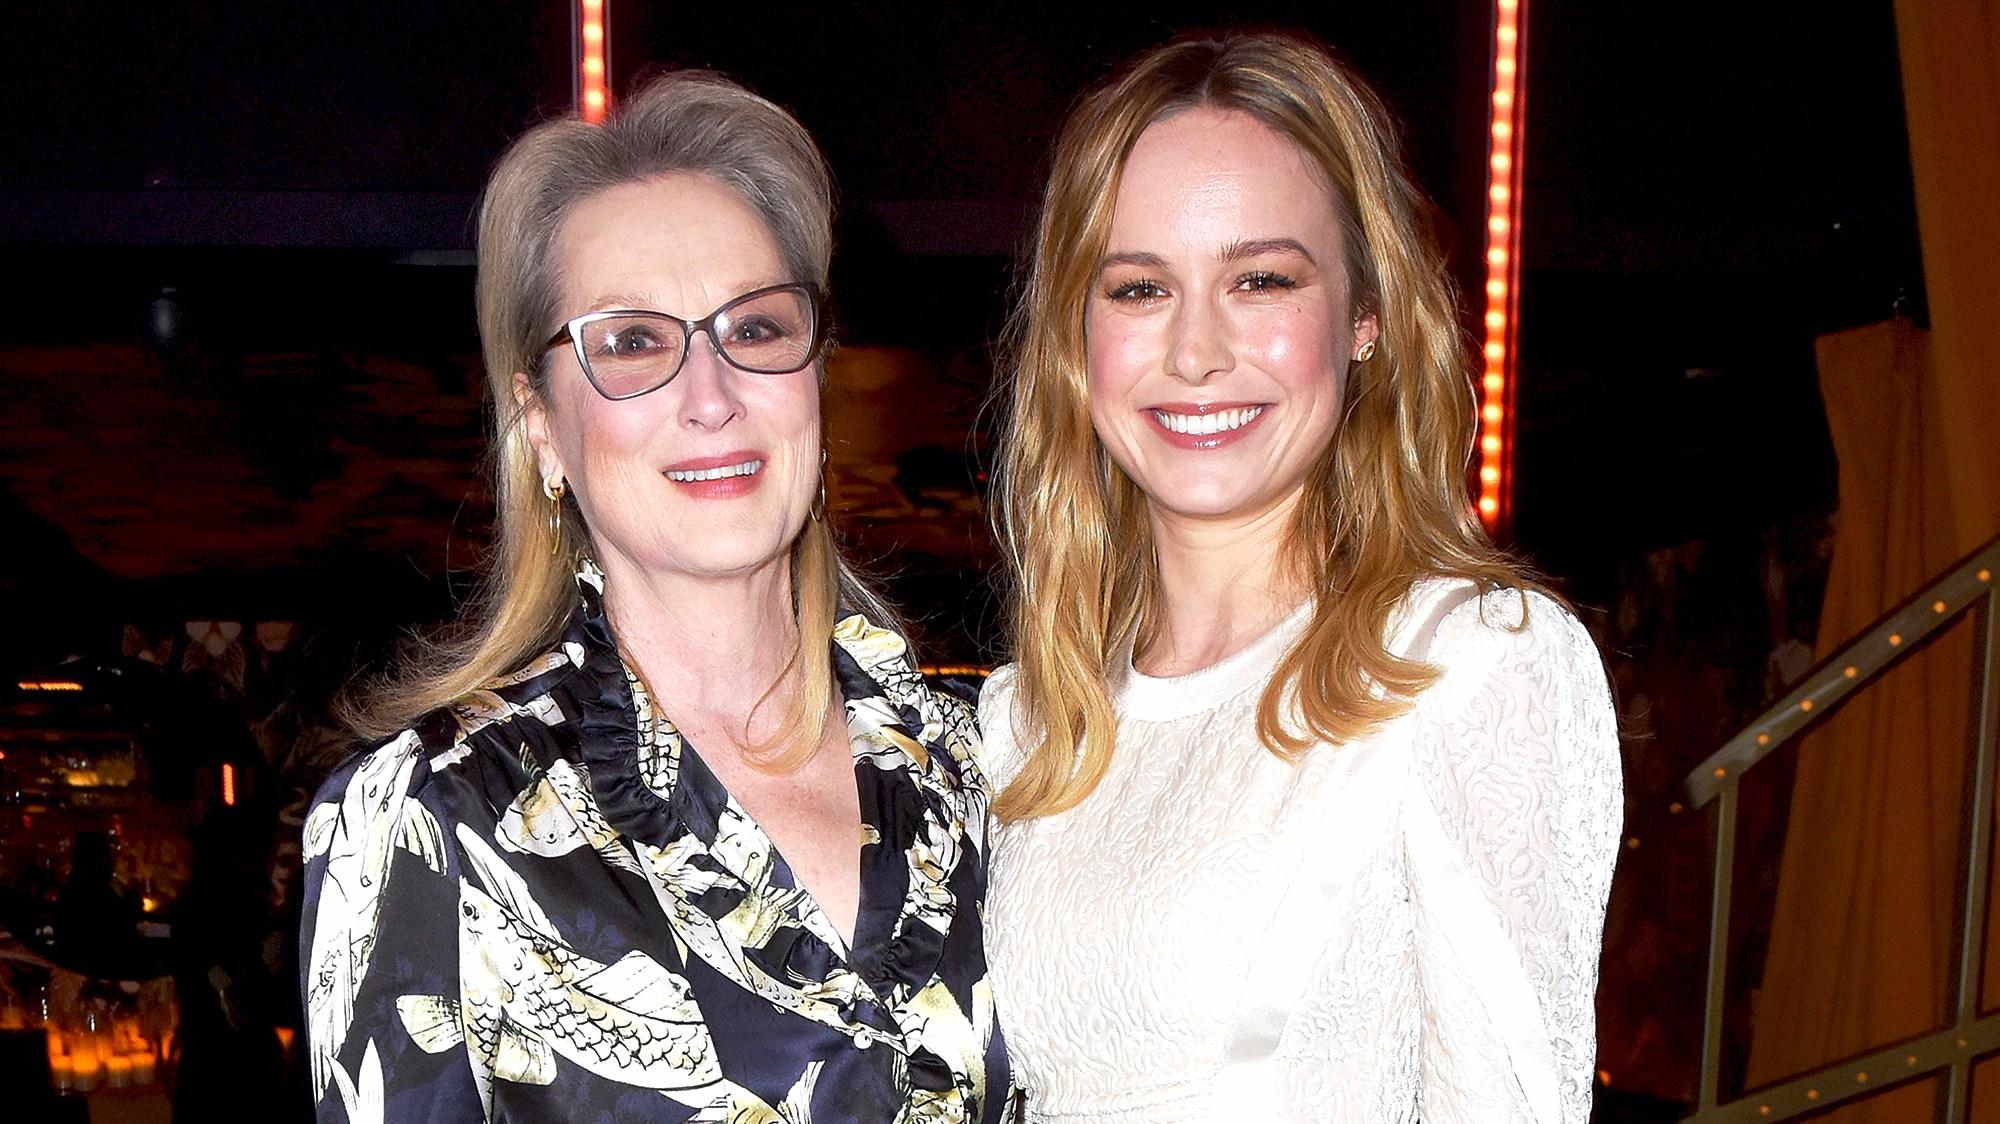 Meryl Streep and Brie Larson